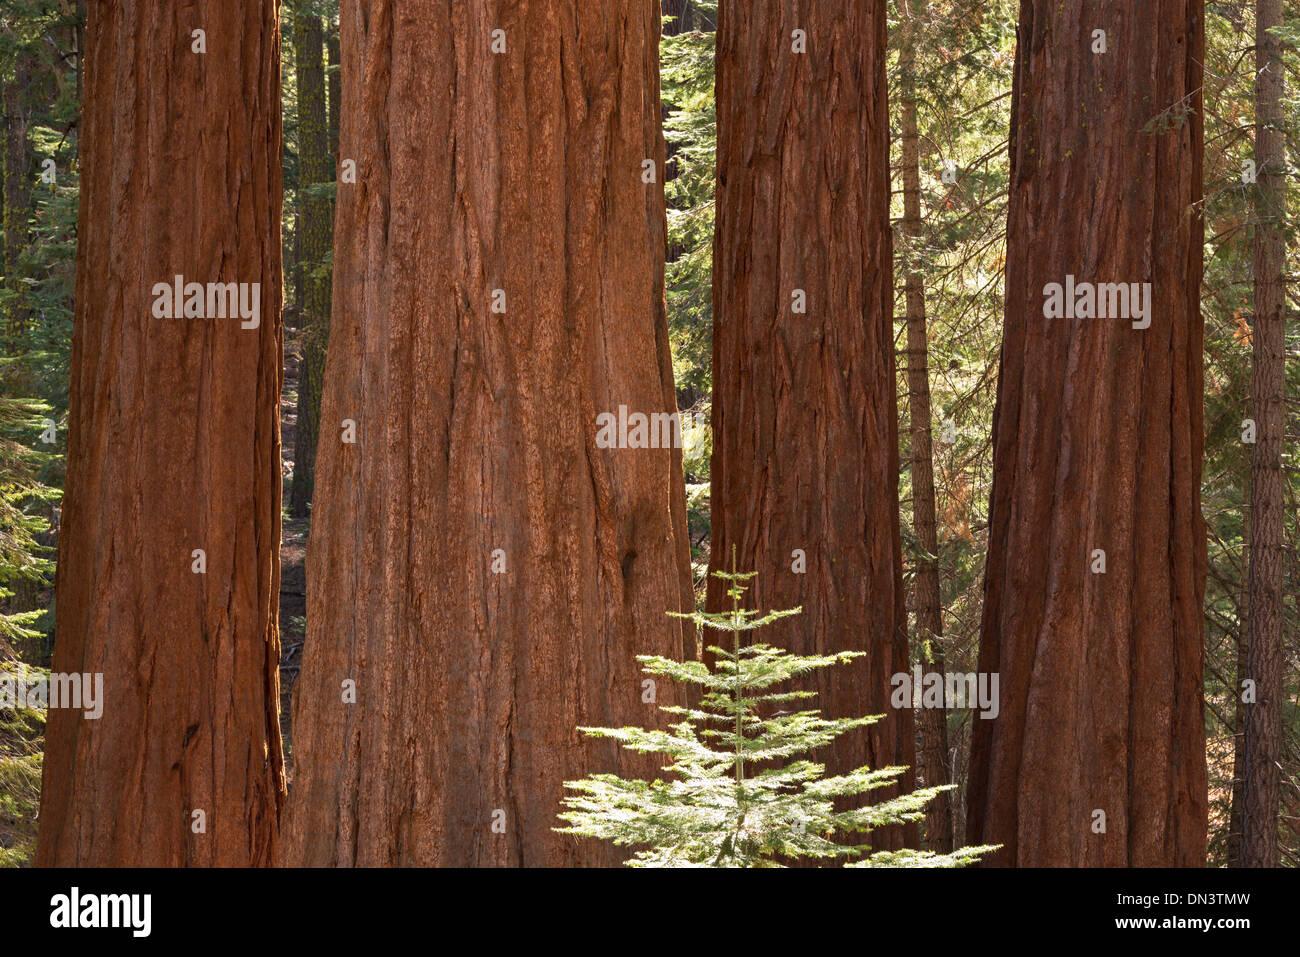 Giant Sequoia trees (Sequoiadendron giganteum) in Mariposa Grove, Yosemite National Park, California, USA. - Stock Image